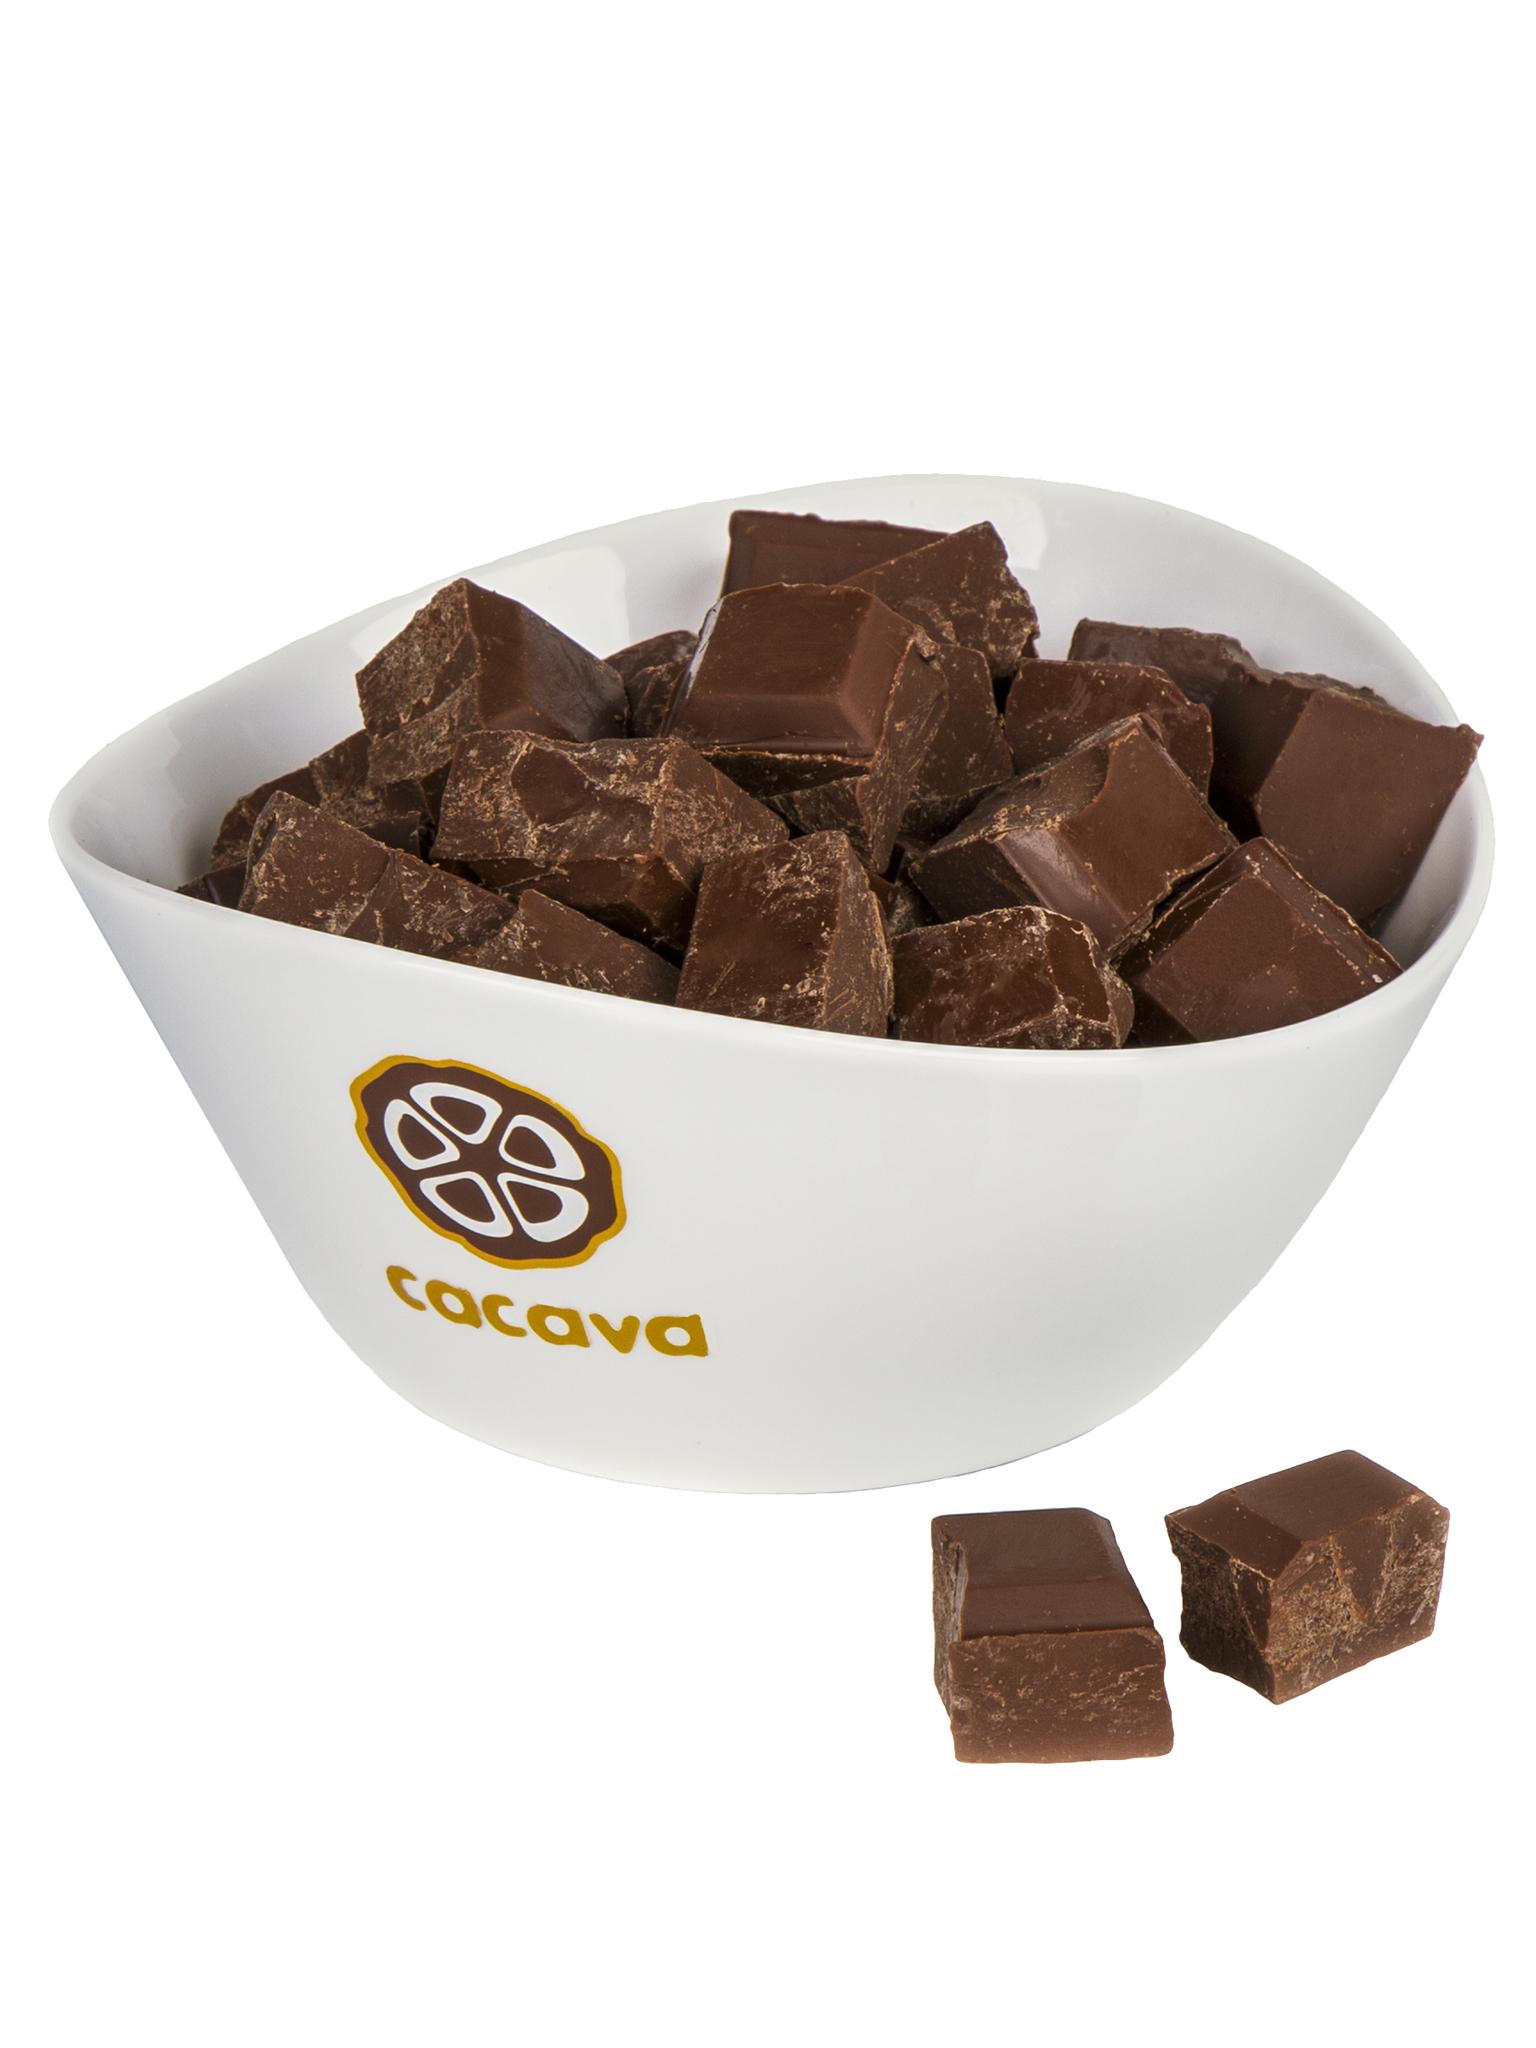 Молочный шоколад 50 % какао (Перу), внешний вид